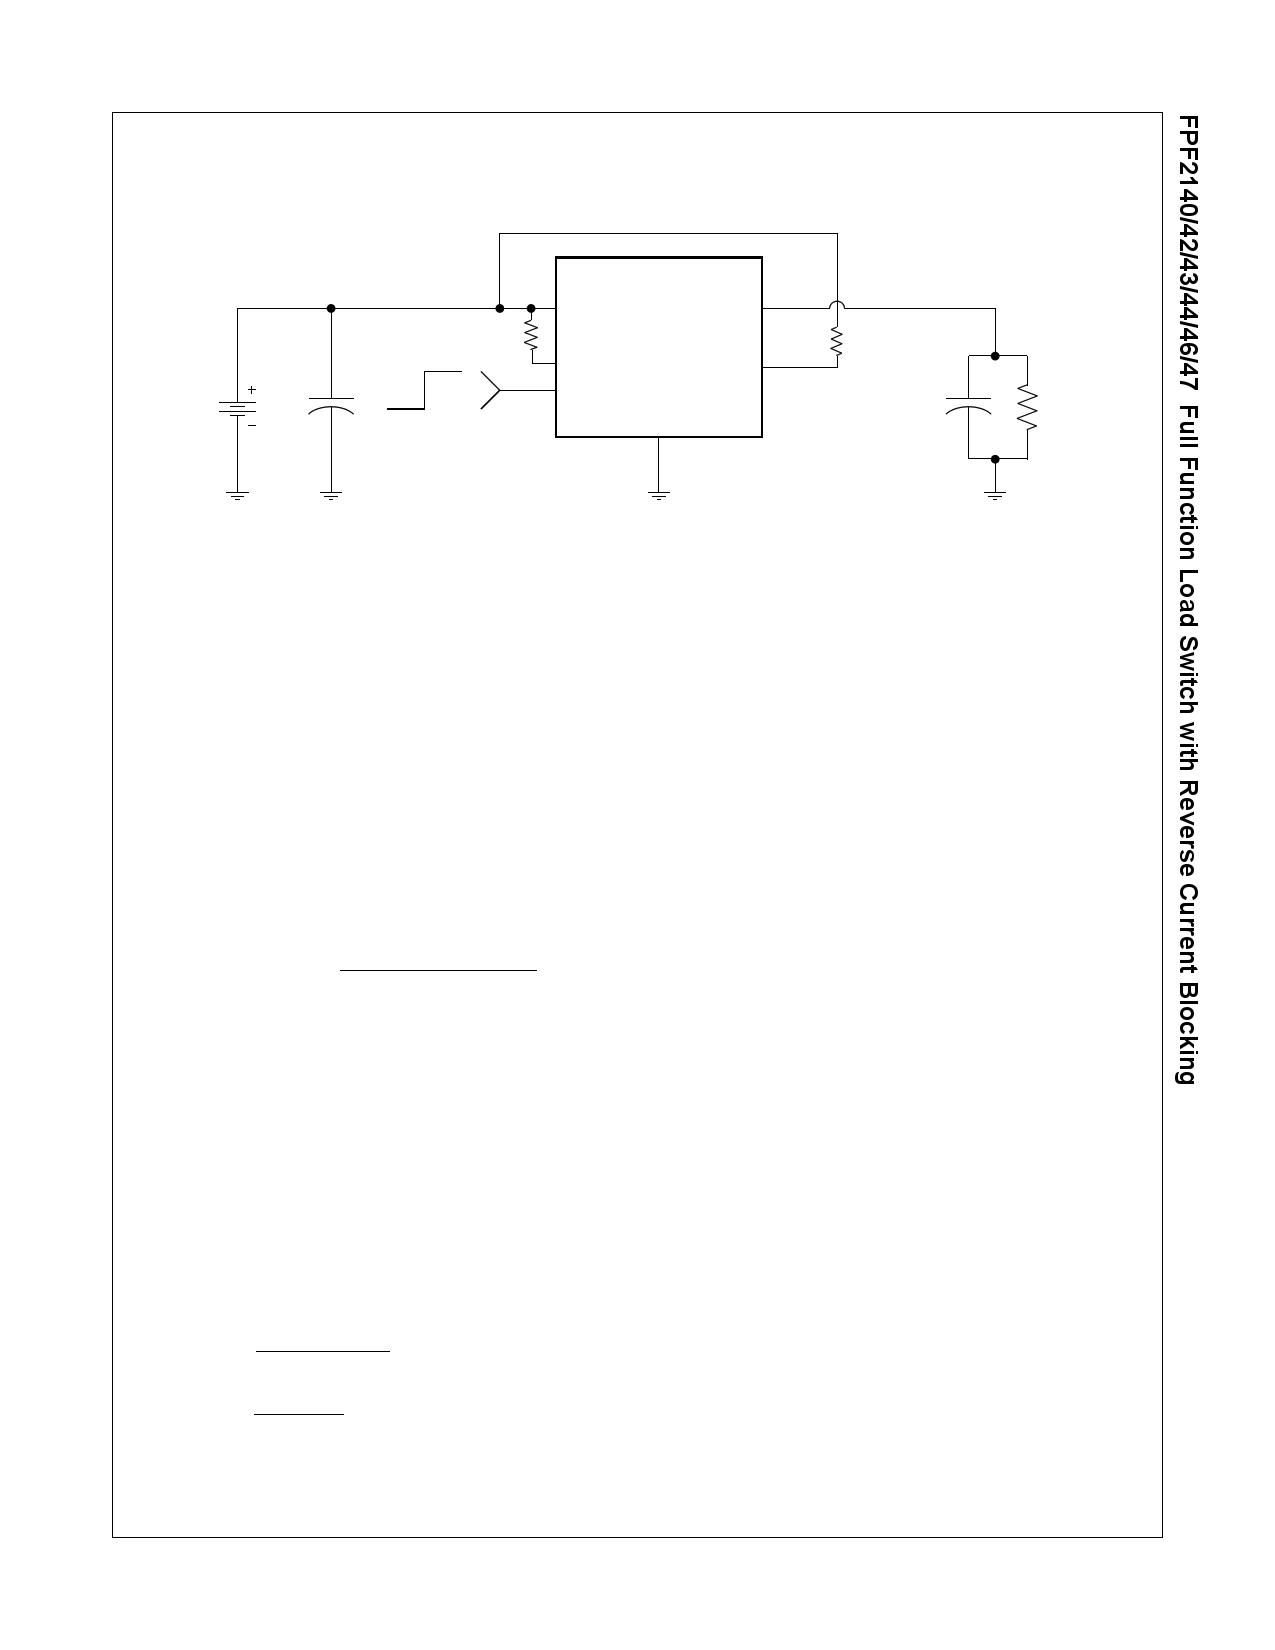 FPF2143 arduino